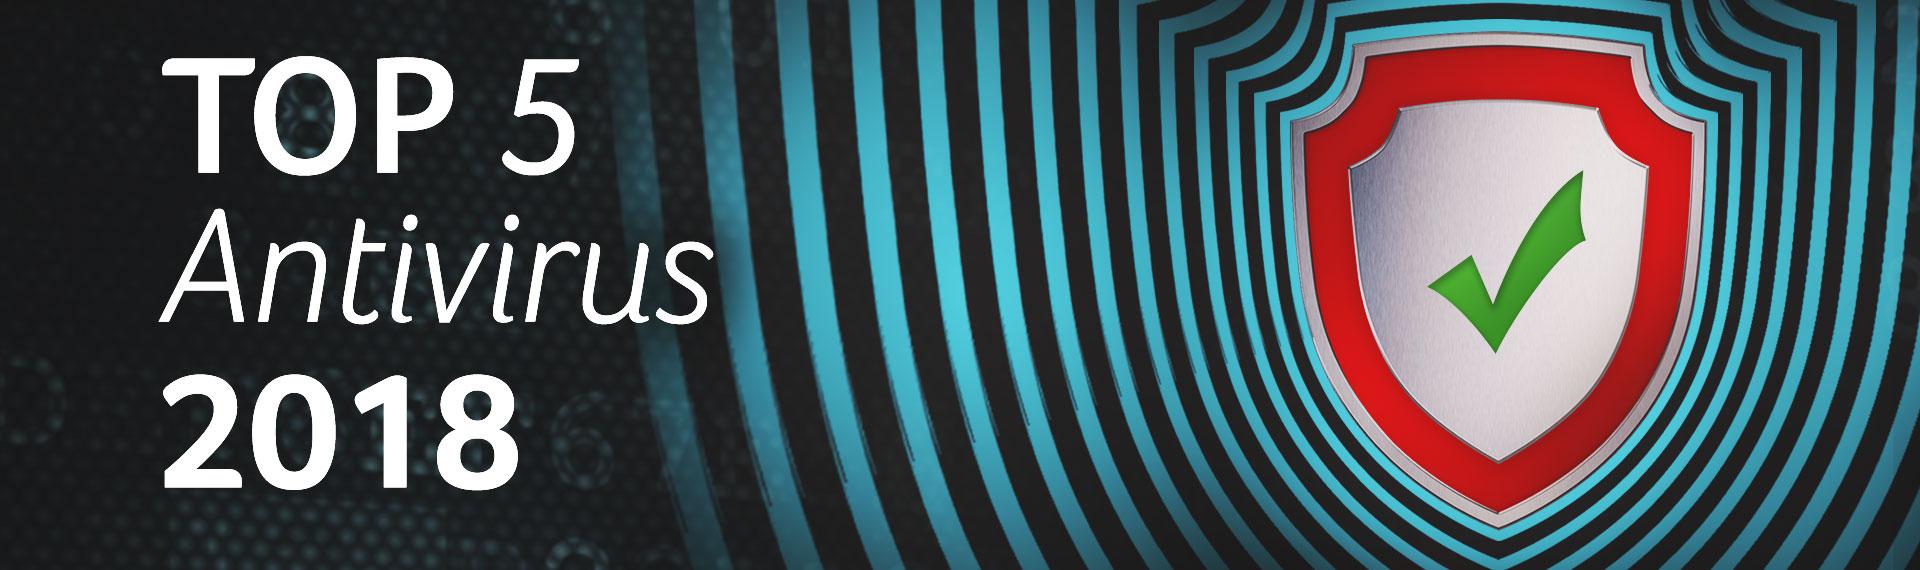 5 Antivirus Terbaik untuk PC di Tahun 2018!